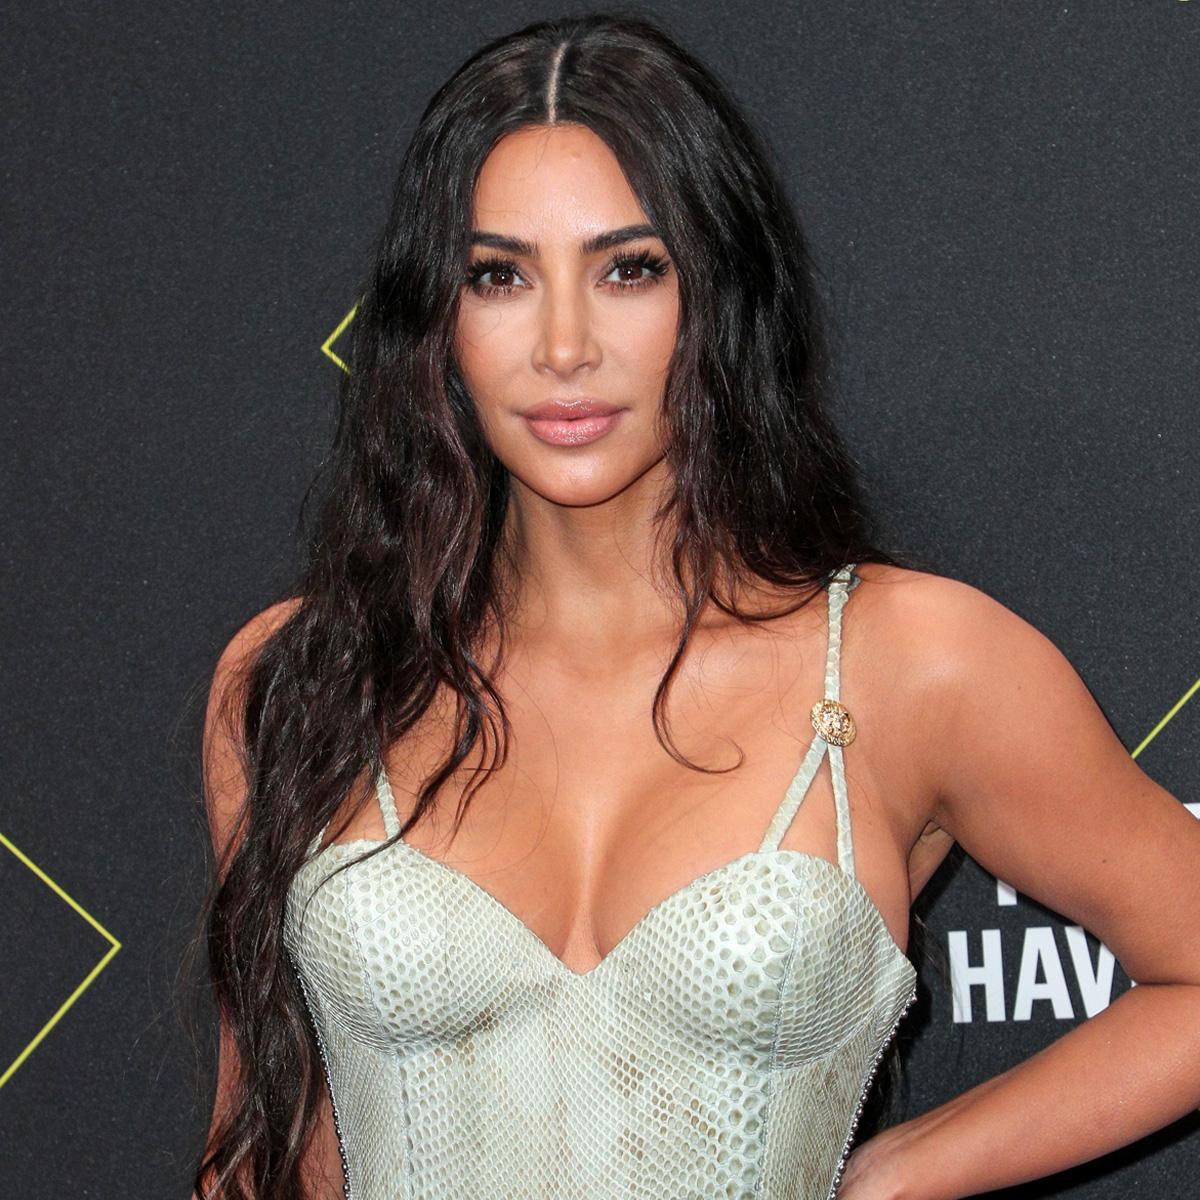 Kim Kardashian Makes Everyone Green With Envy in Her Daring Givenchy Dress